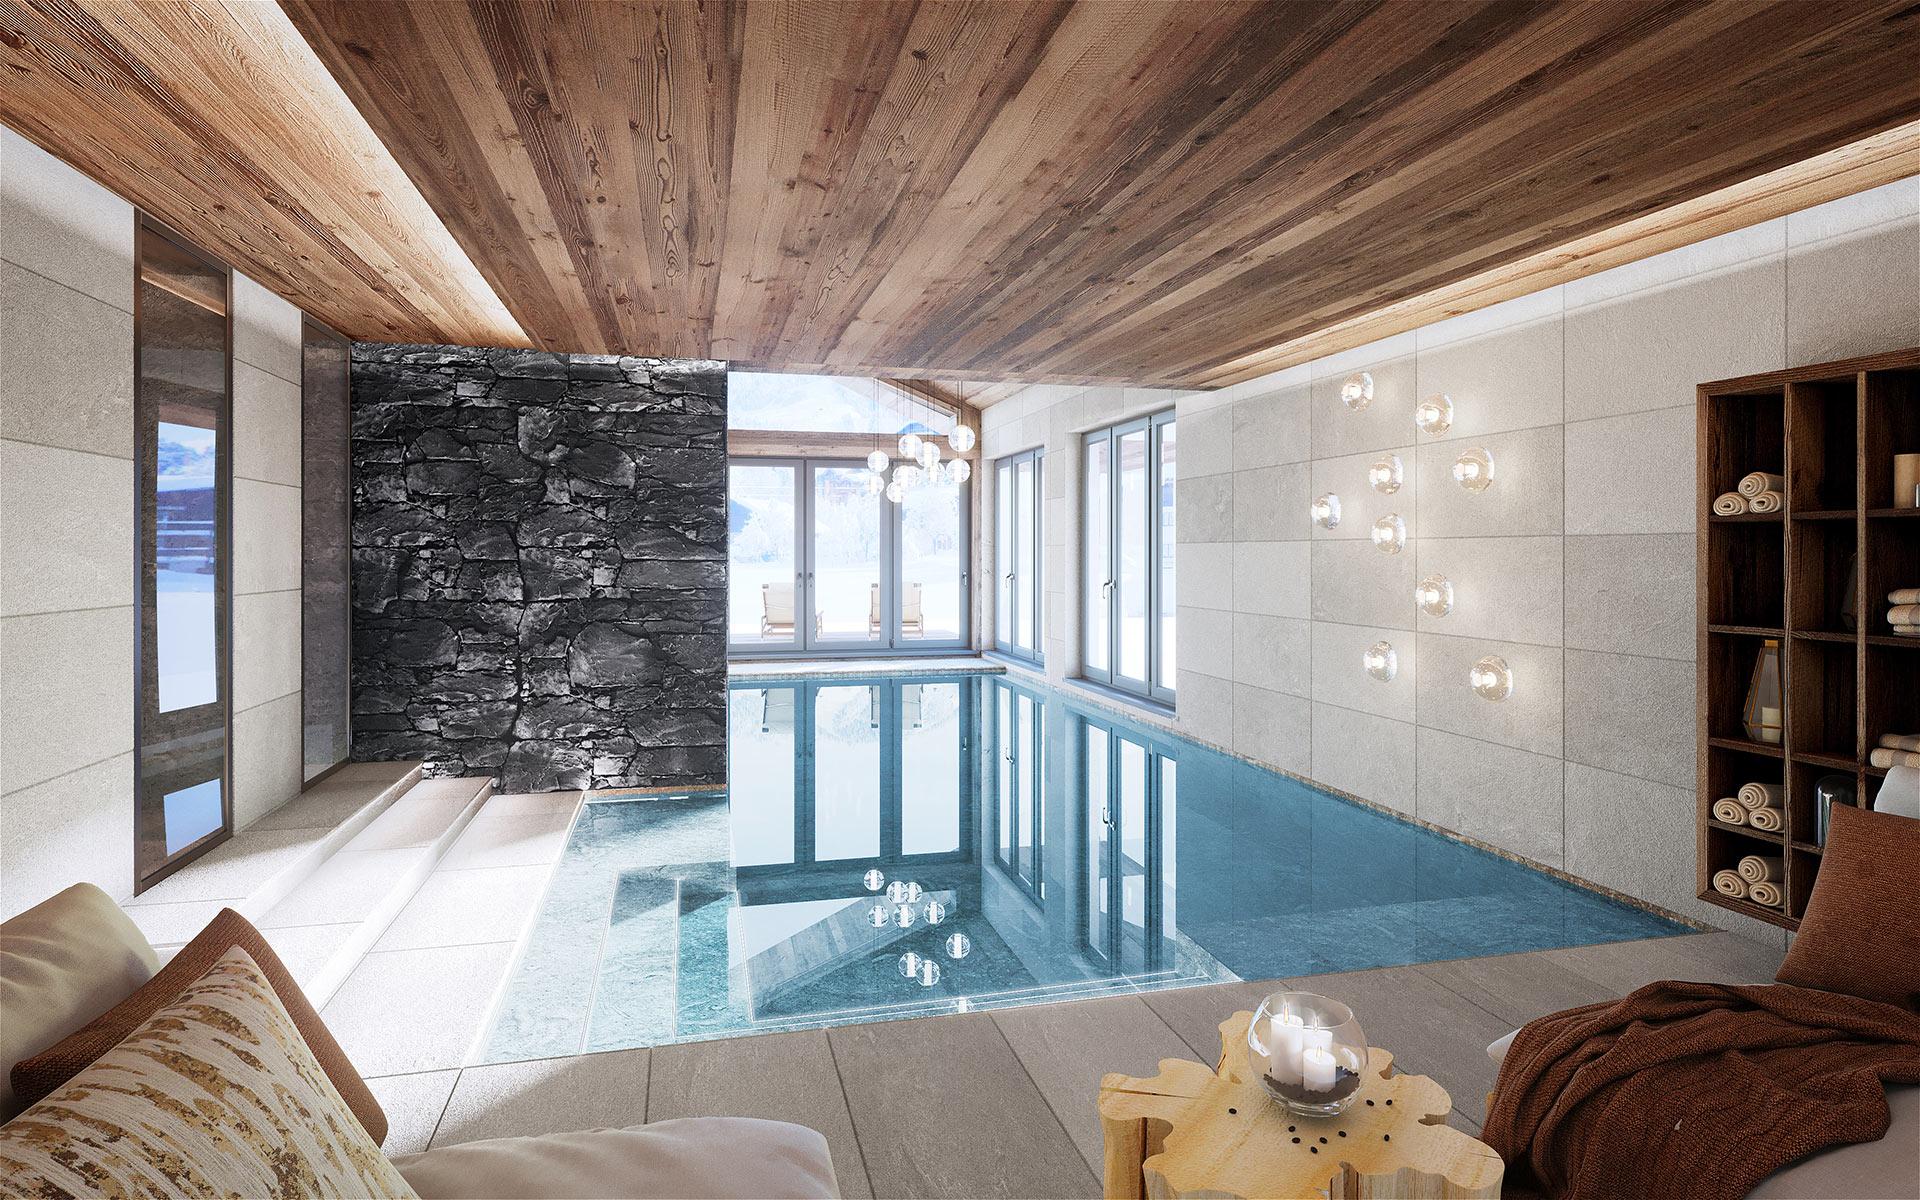 3D render of a luxury chalet pool